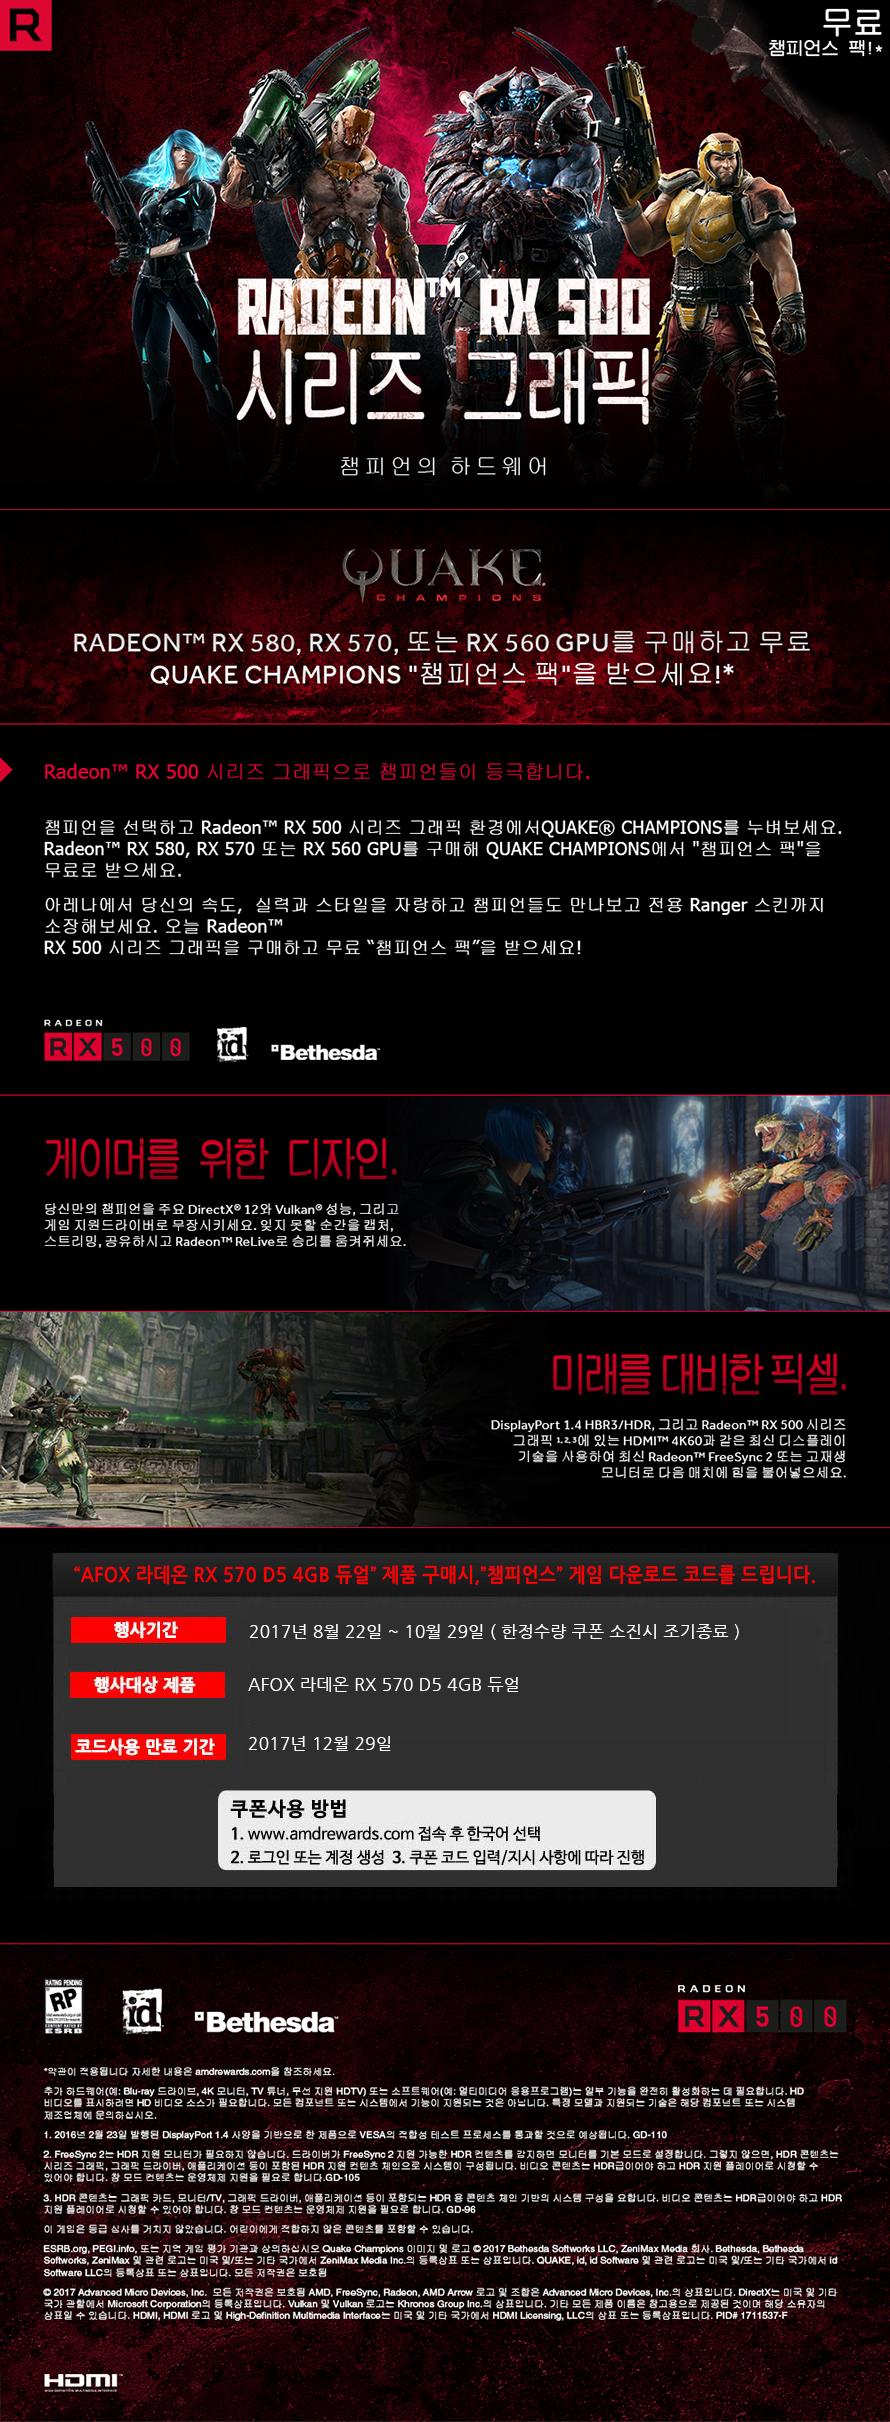 AFOX-게임쿠폰증정행사.jpg